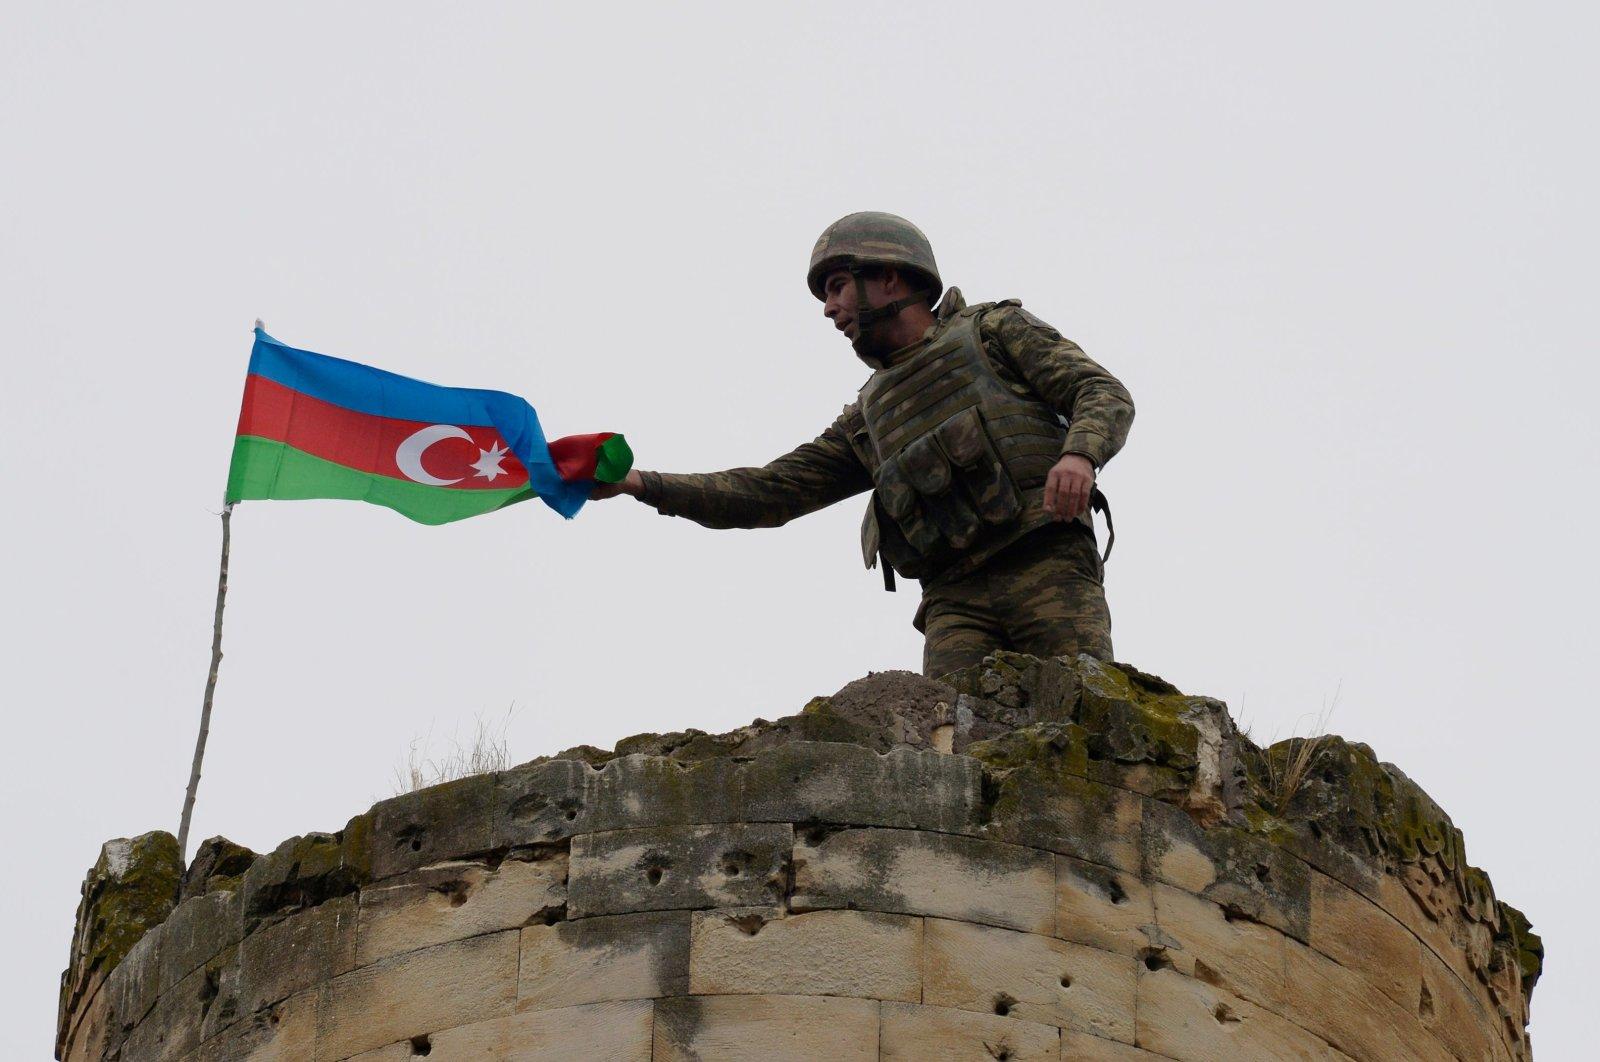 An Azerbaijani soldier attaches a national flag on a tower outside the town of Fuzuli, Azerbaijan, Nov. 26, 2020. (AFP Photo)